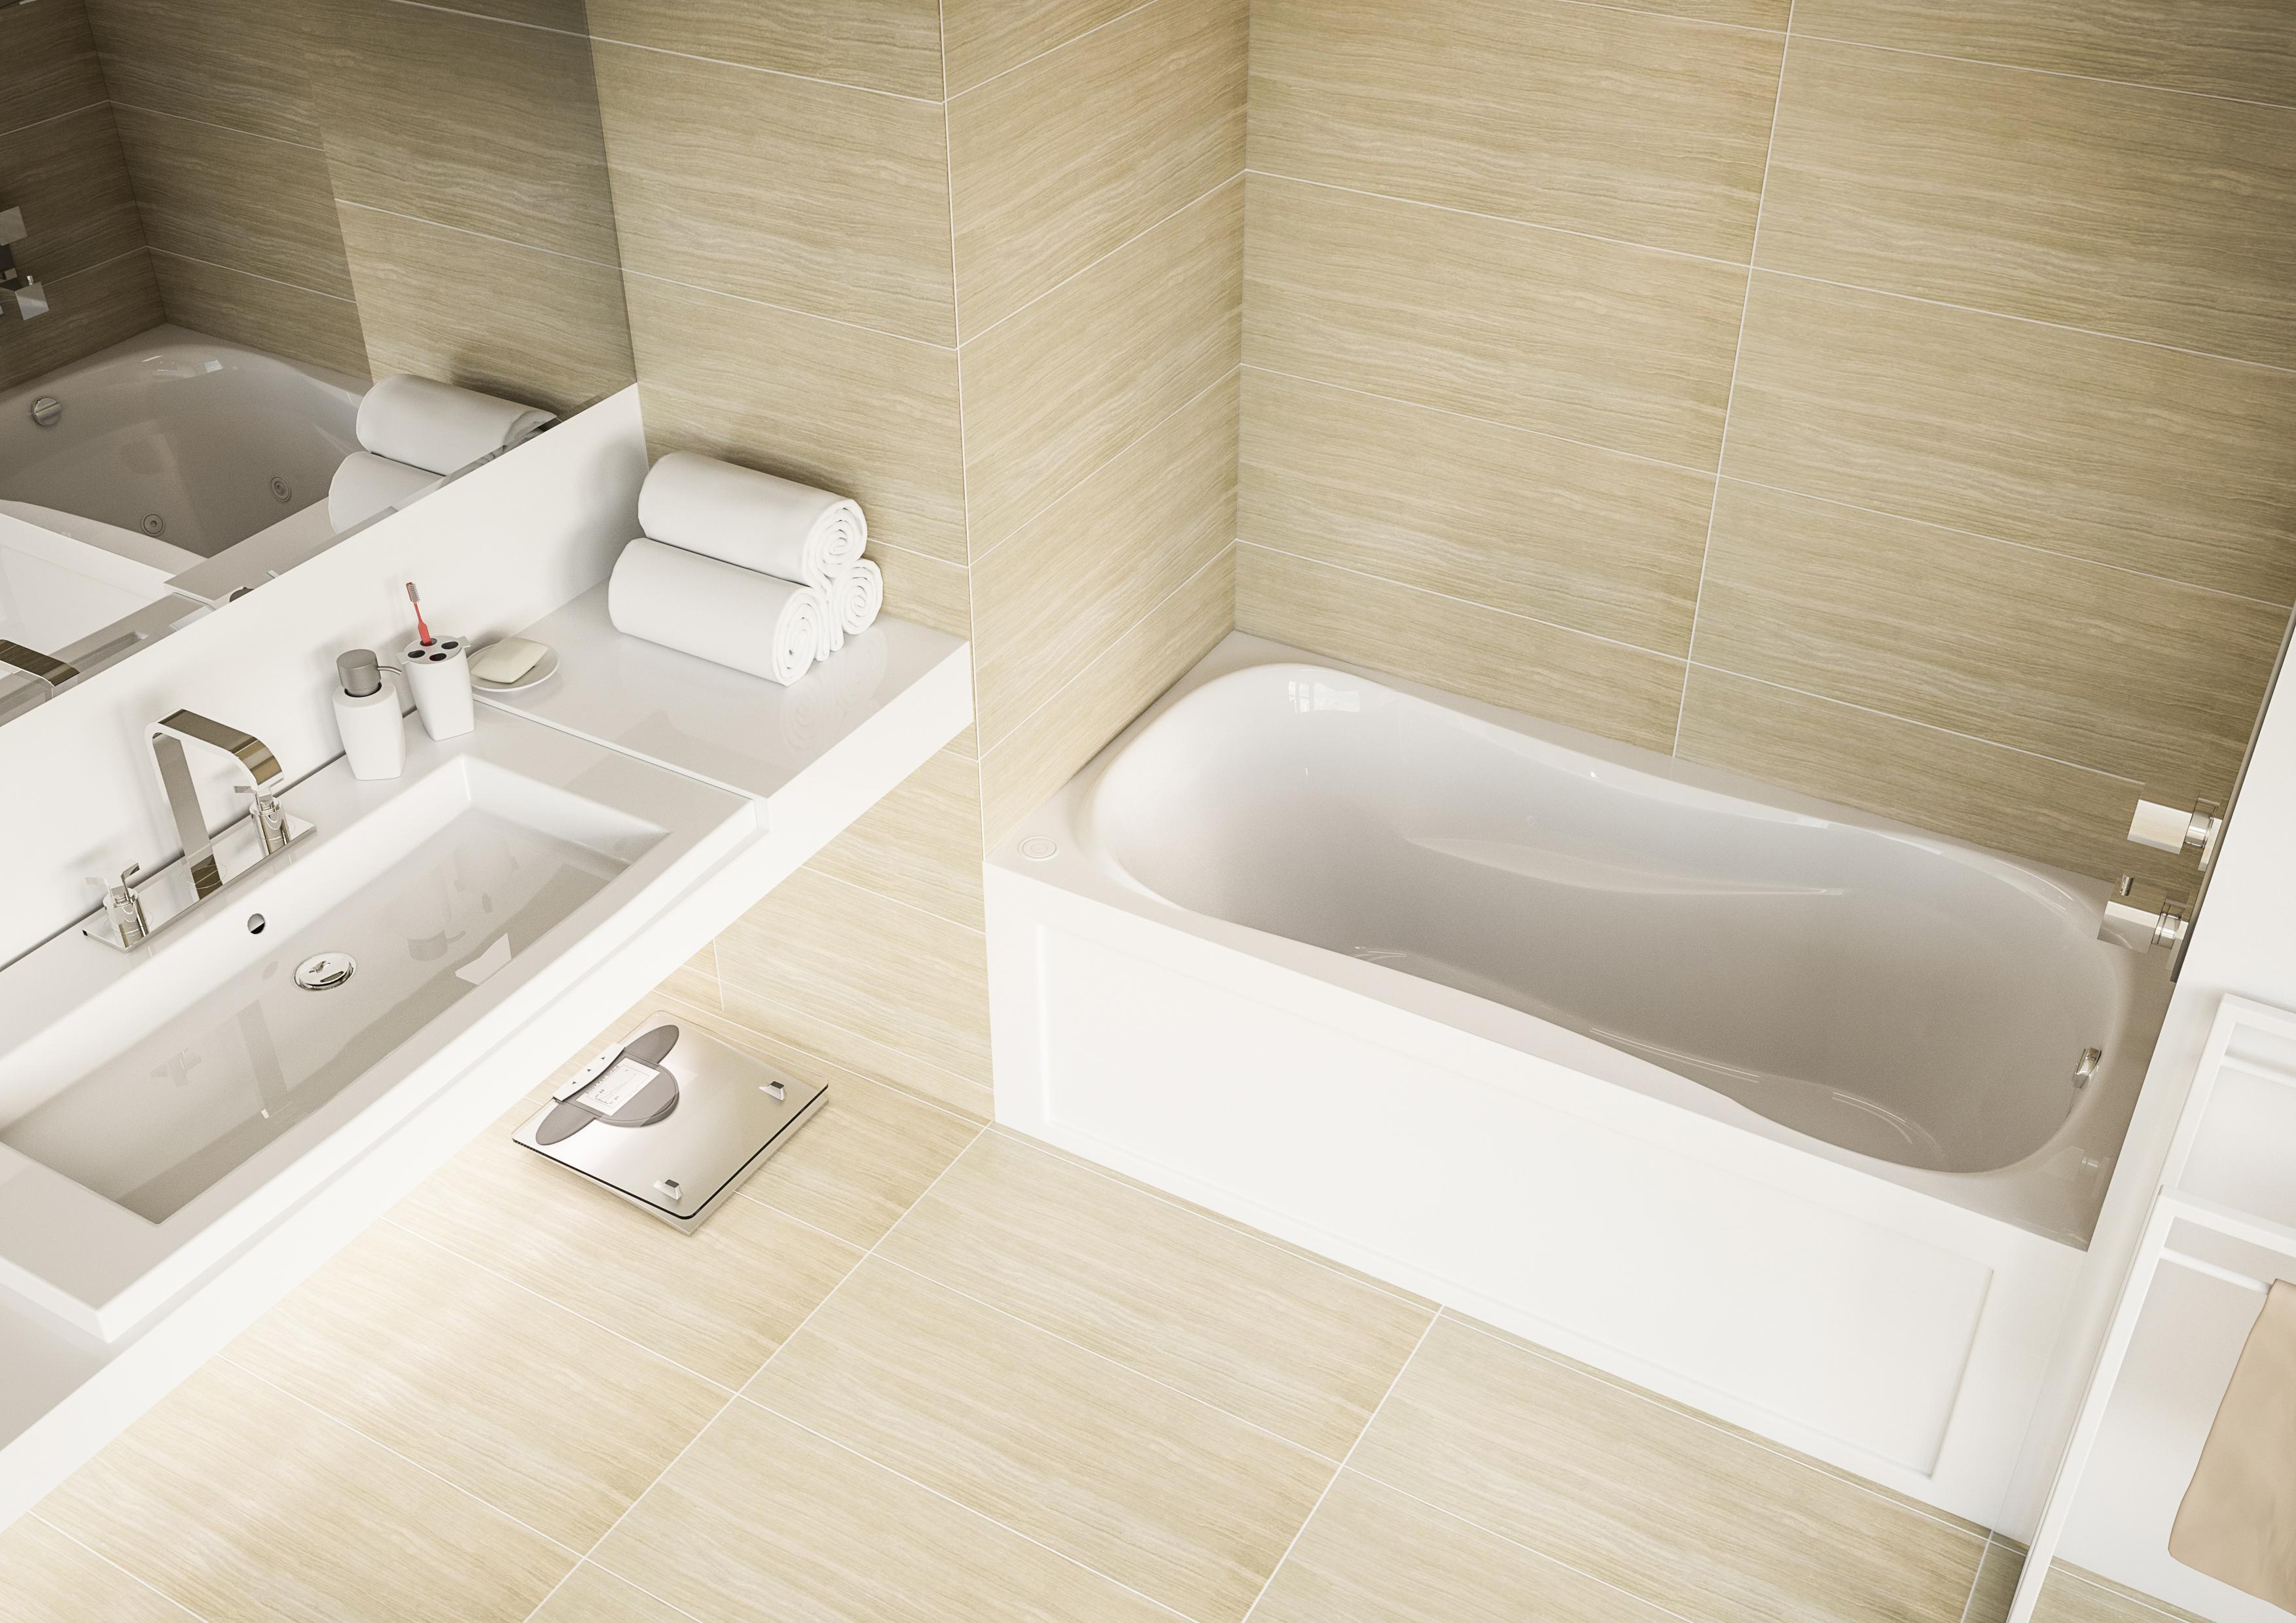 product araya resolution bathtub image mirolin x baths interior alcove final high